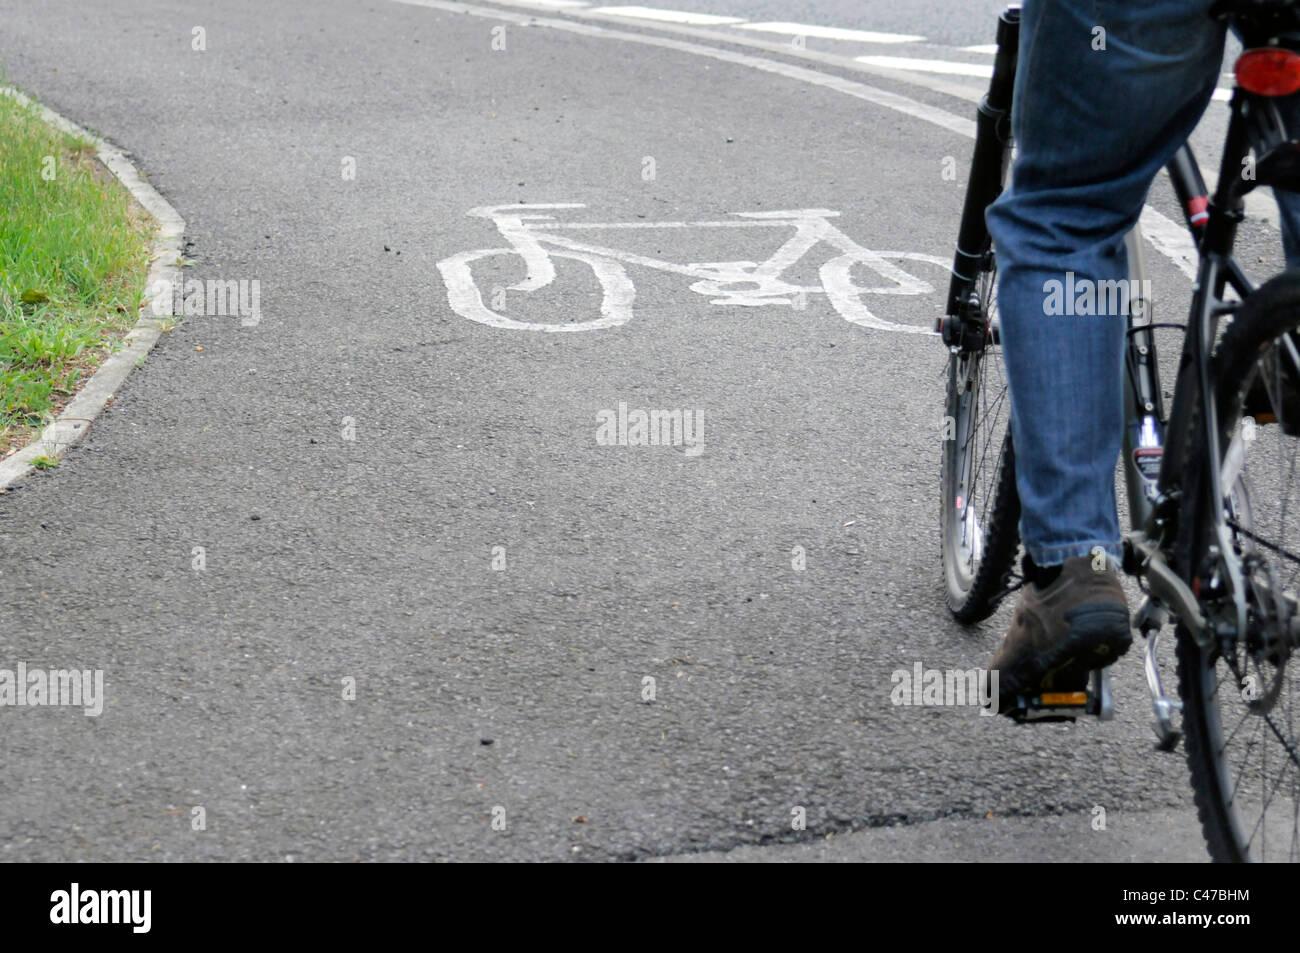 Cyclist on Cycle Lane - Stock Image